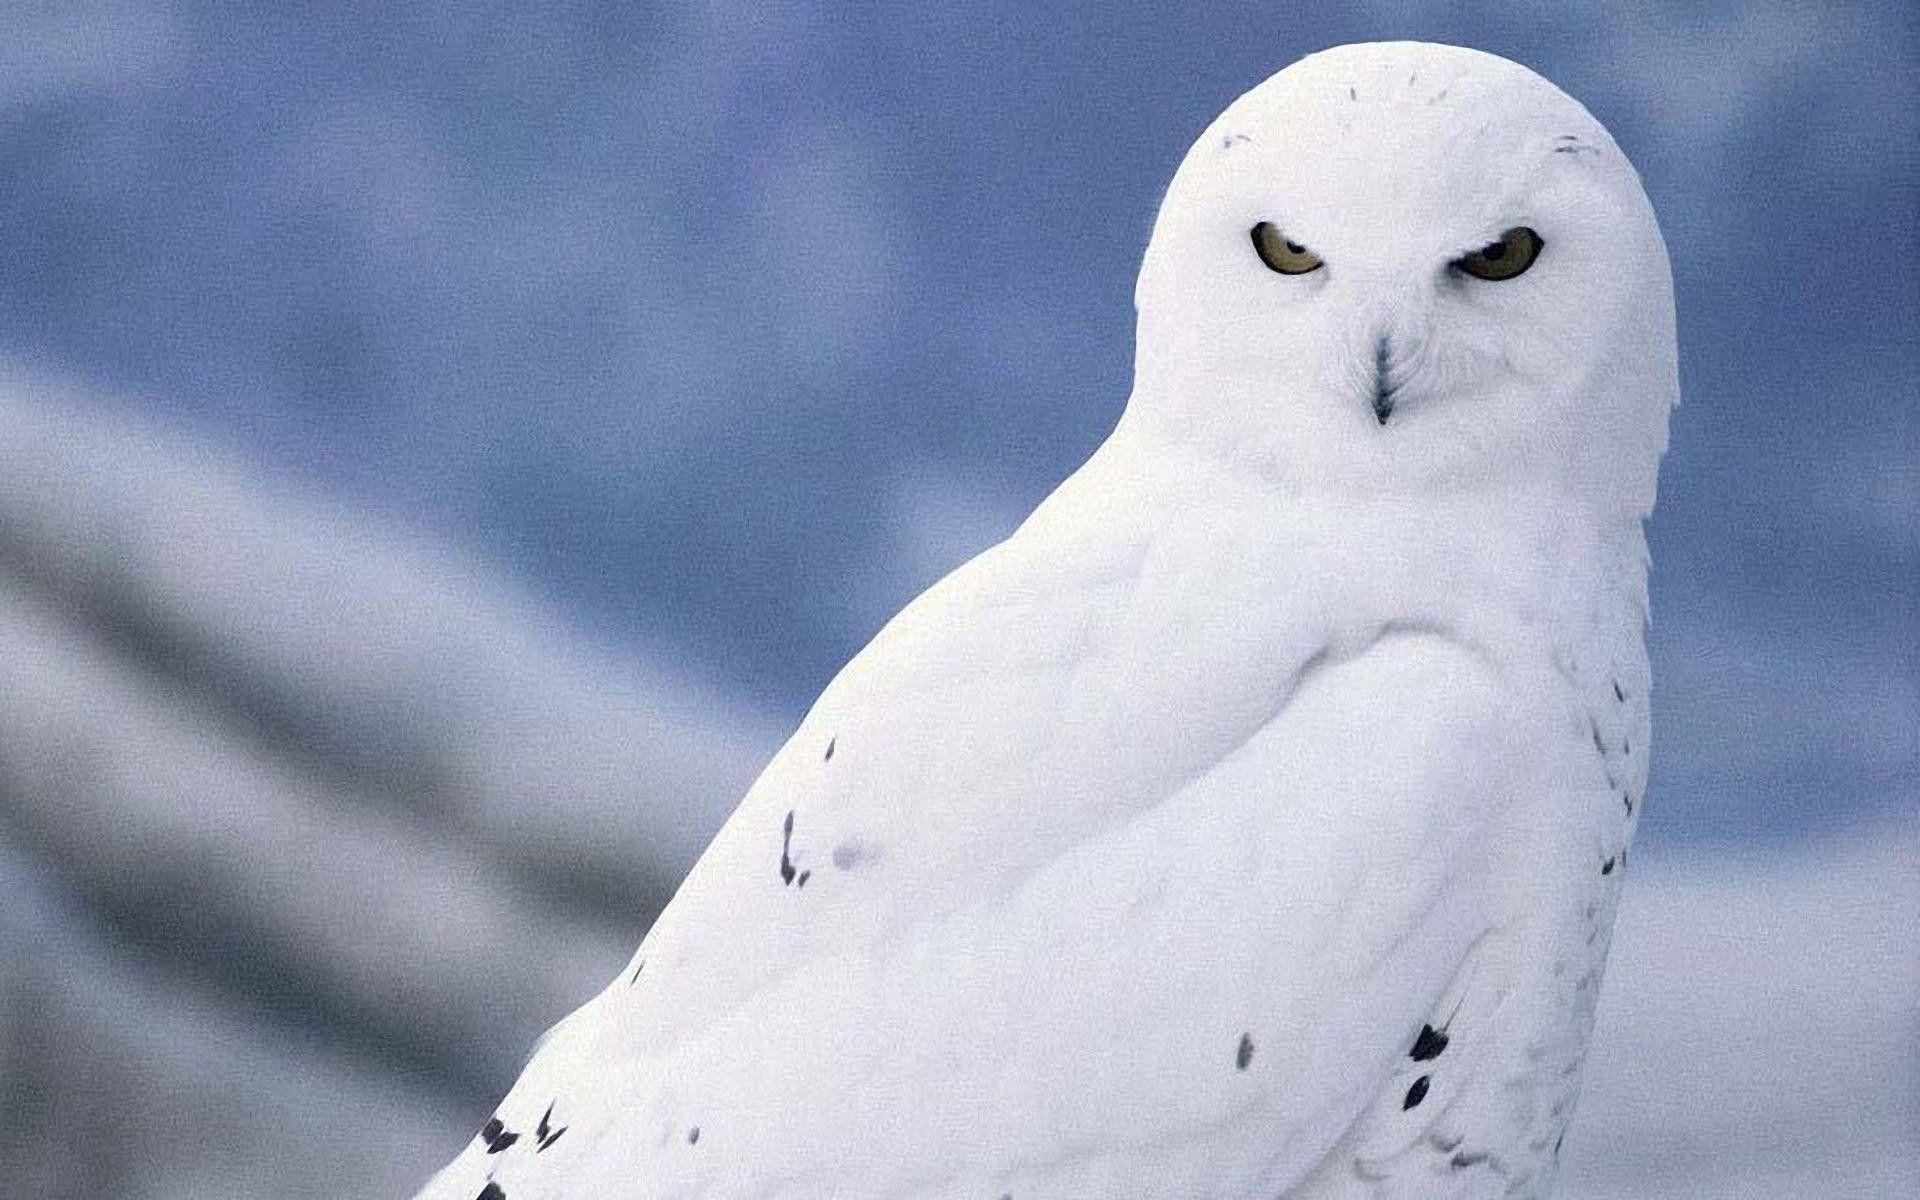 Windows 10 White Owl Wallpaper Owl Wallpaper Pet Birds Owl